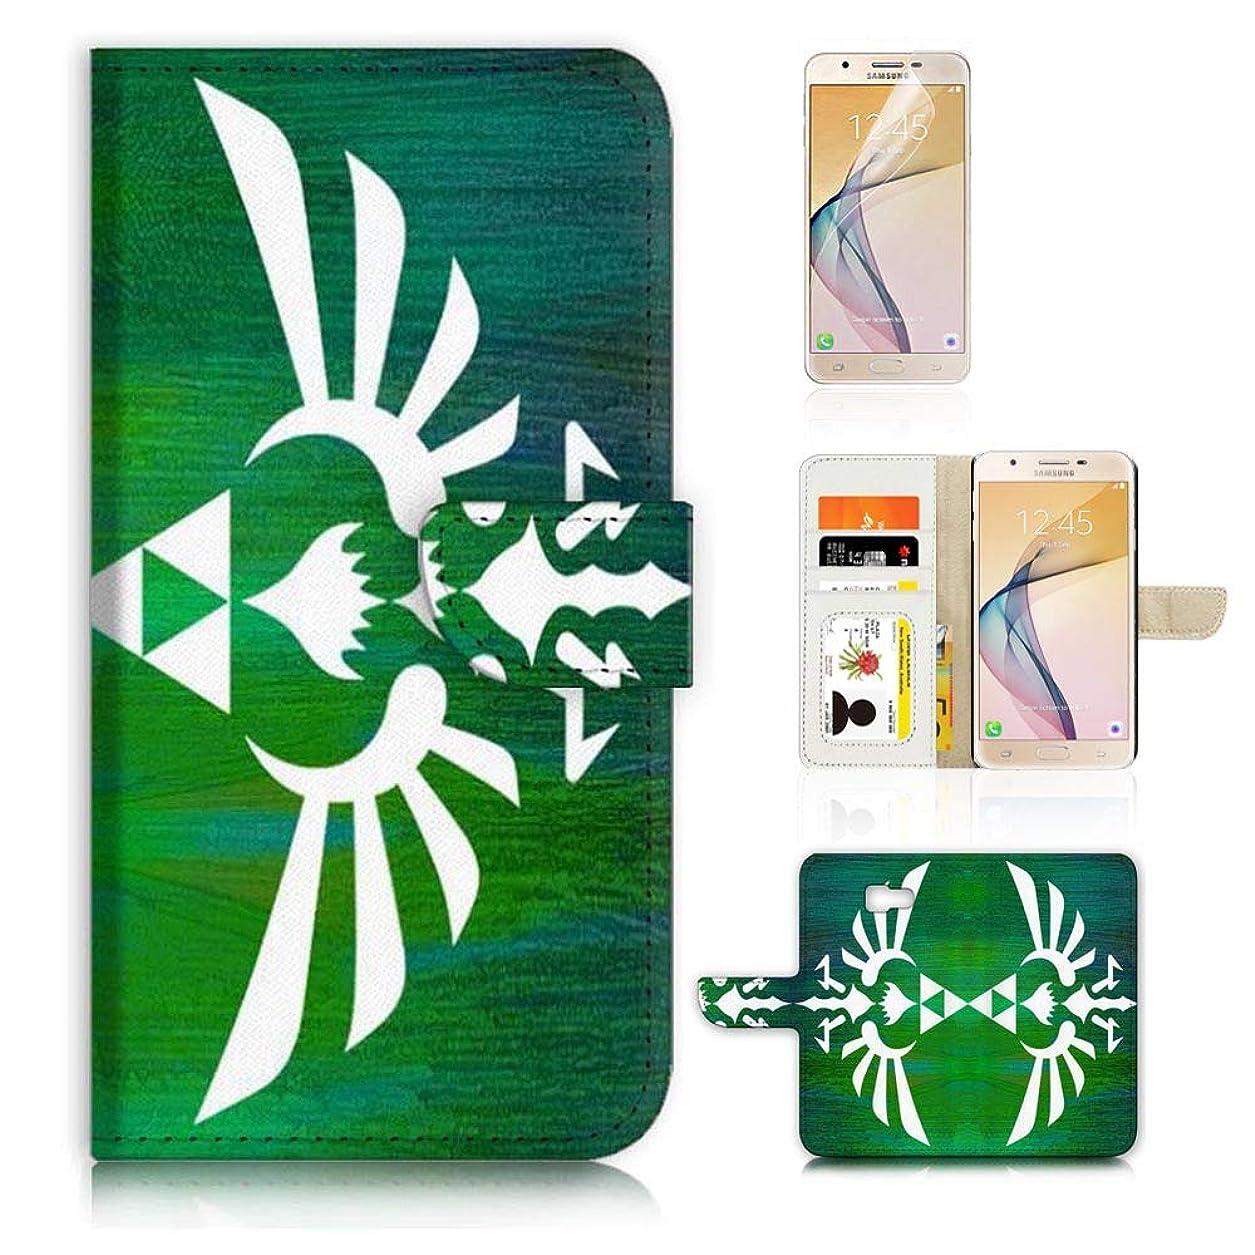 (for Samsung J7 Prime / J7 V / J7 Perx / J7 2017 / J7 Sky Pro/Galaxy Halo) Flip Wallet Style Case Cover, Shock Protection Design with Screen Protector - B31185 Legend of Zelda dnk42168153